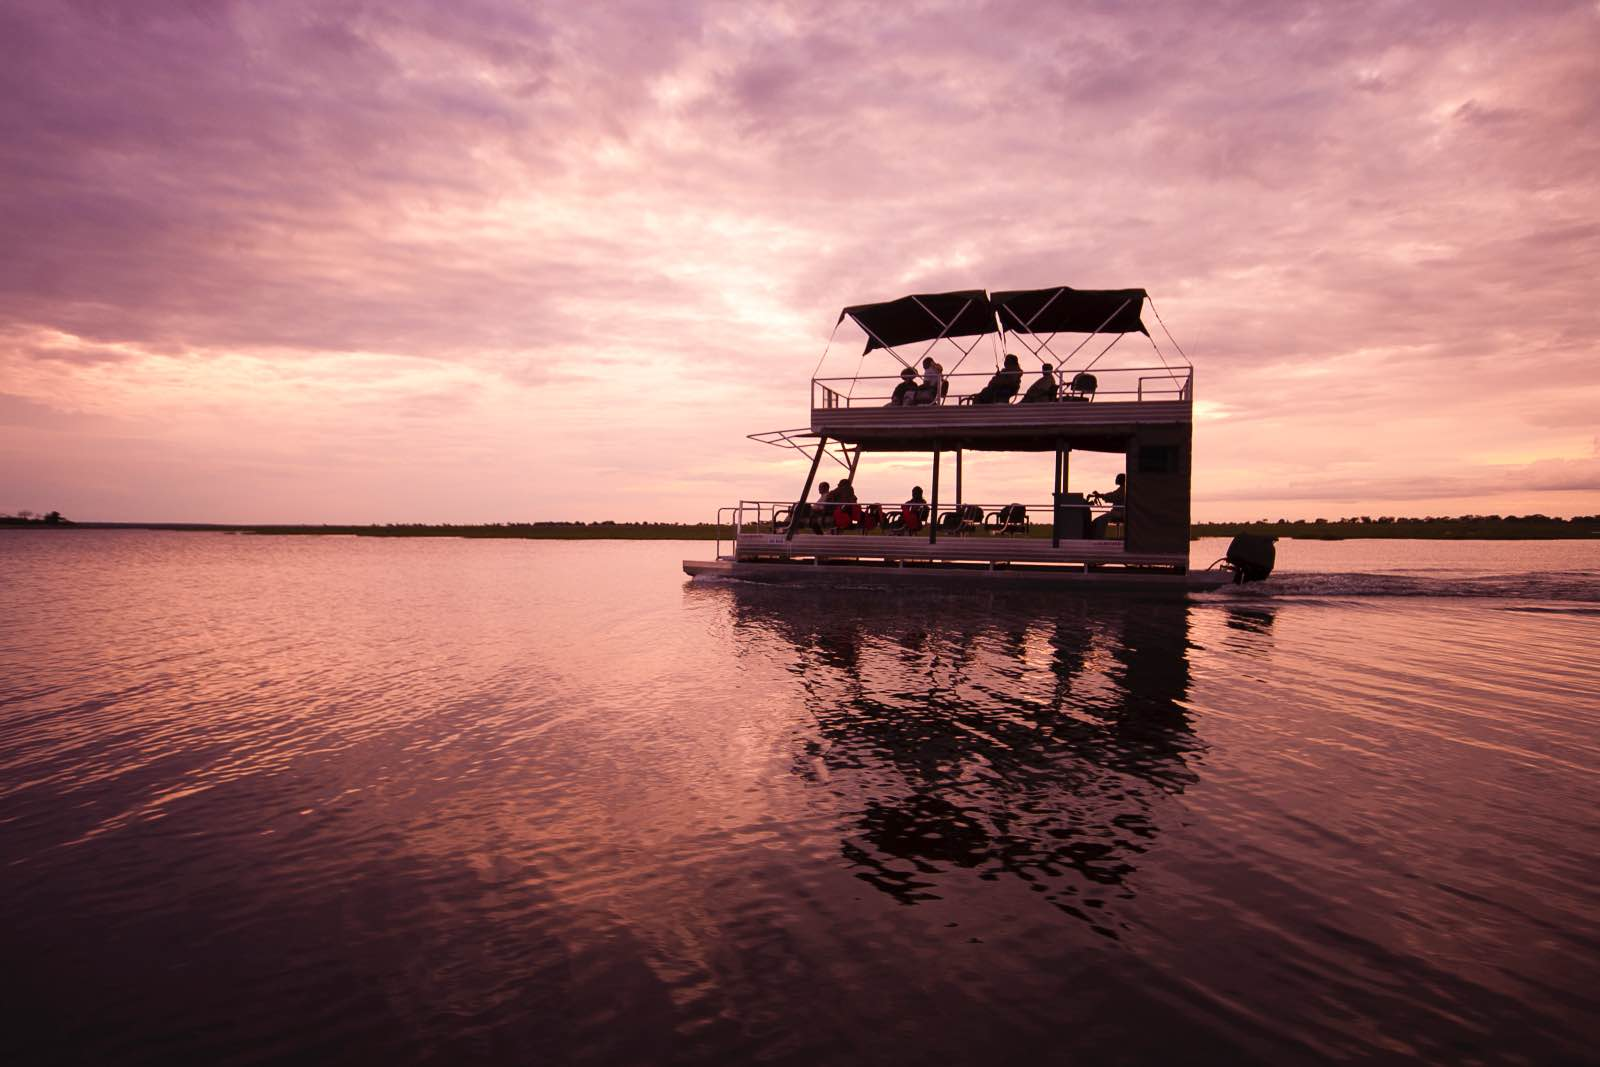 Sunset boat cruise on the Chobe